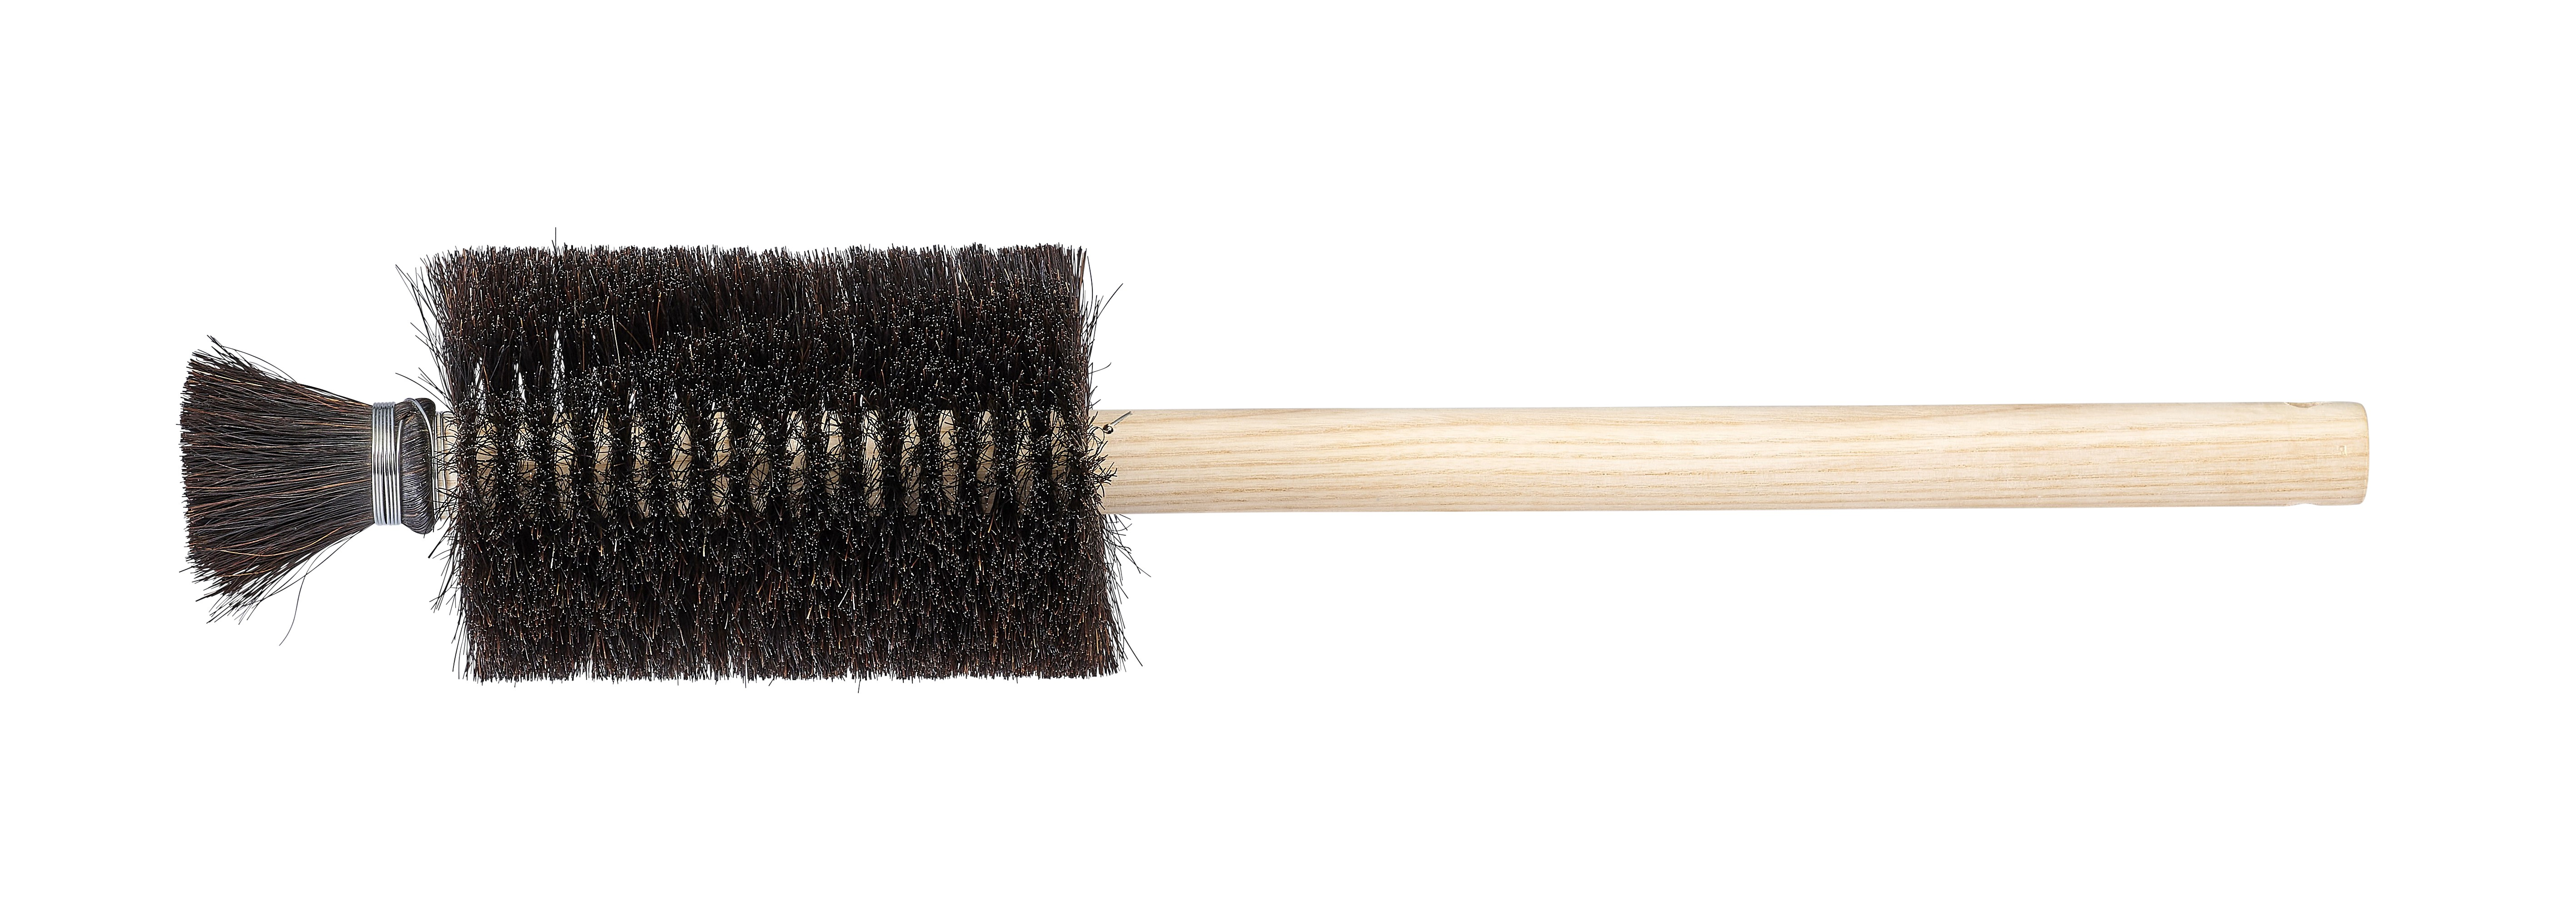 06182 Beaker Brush